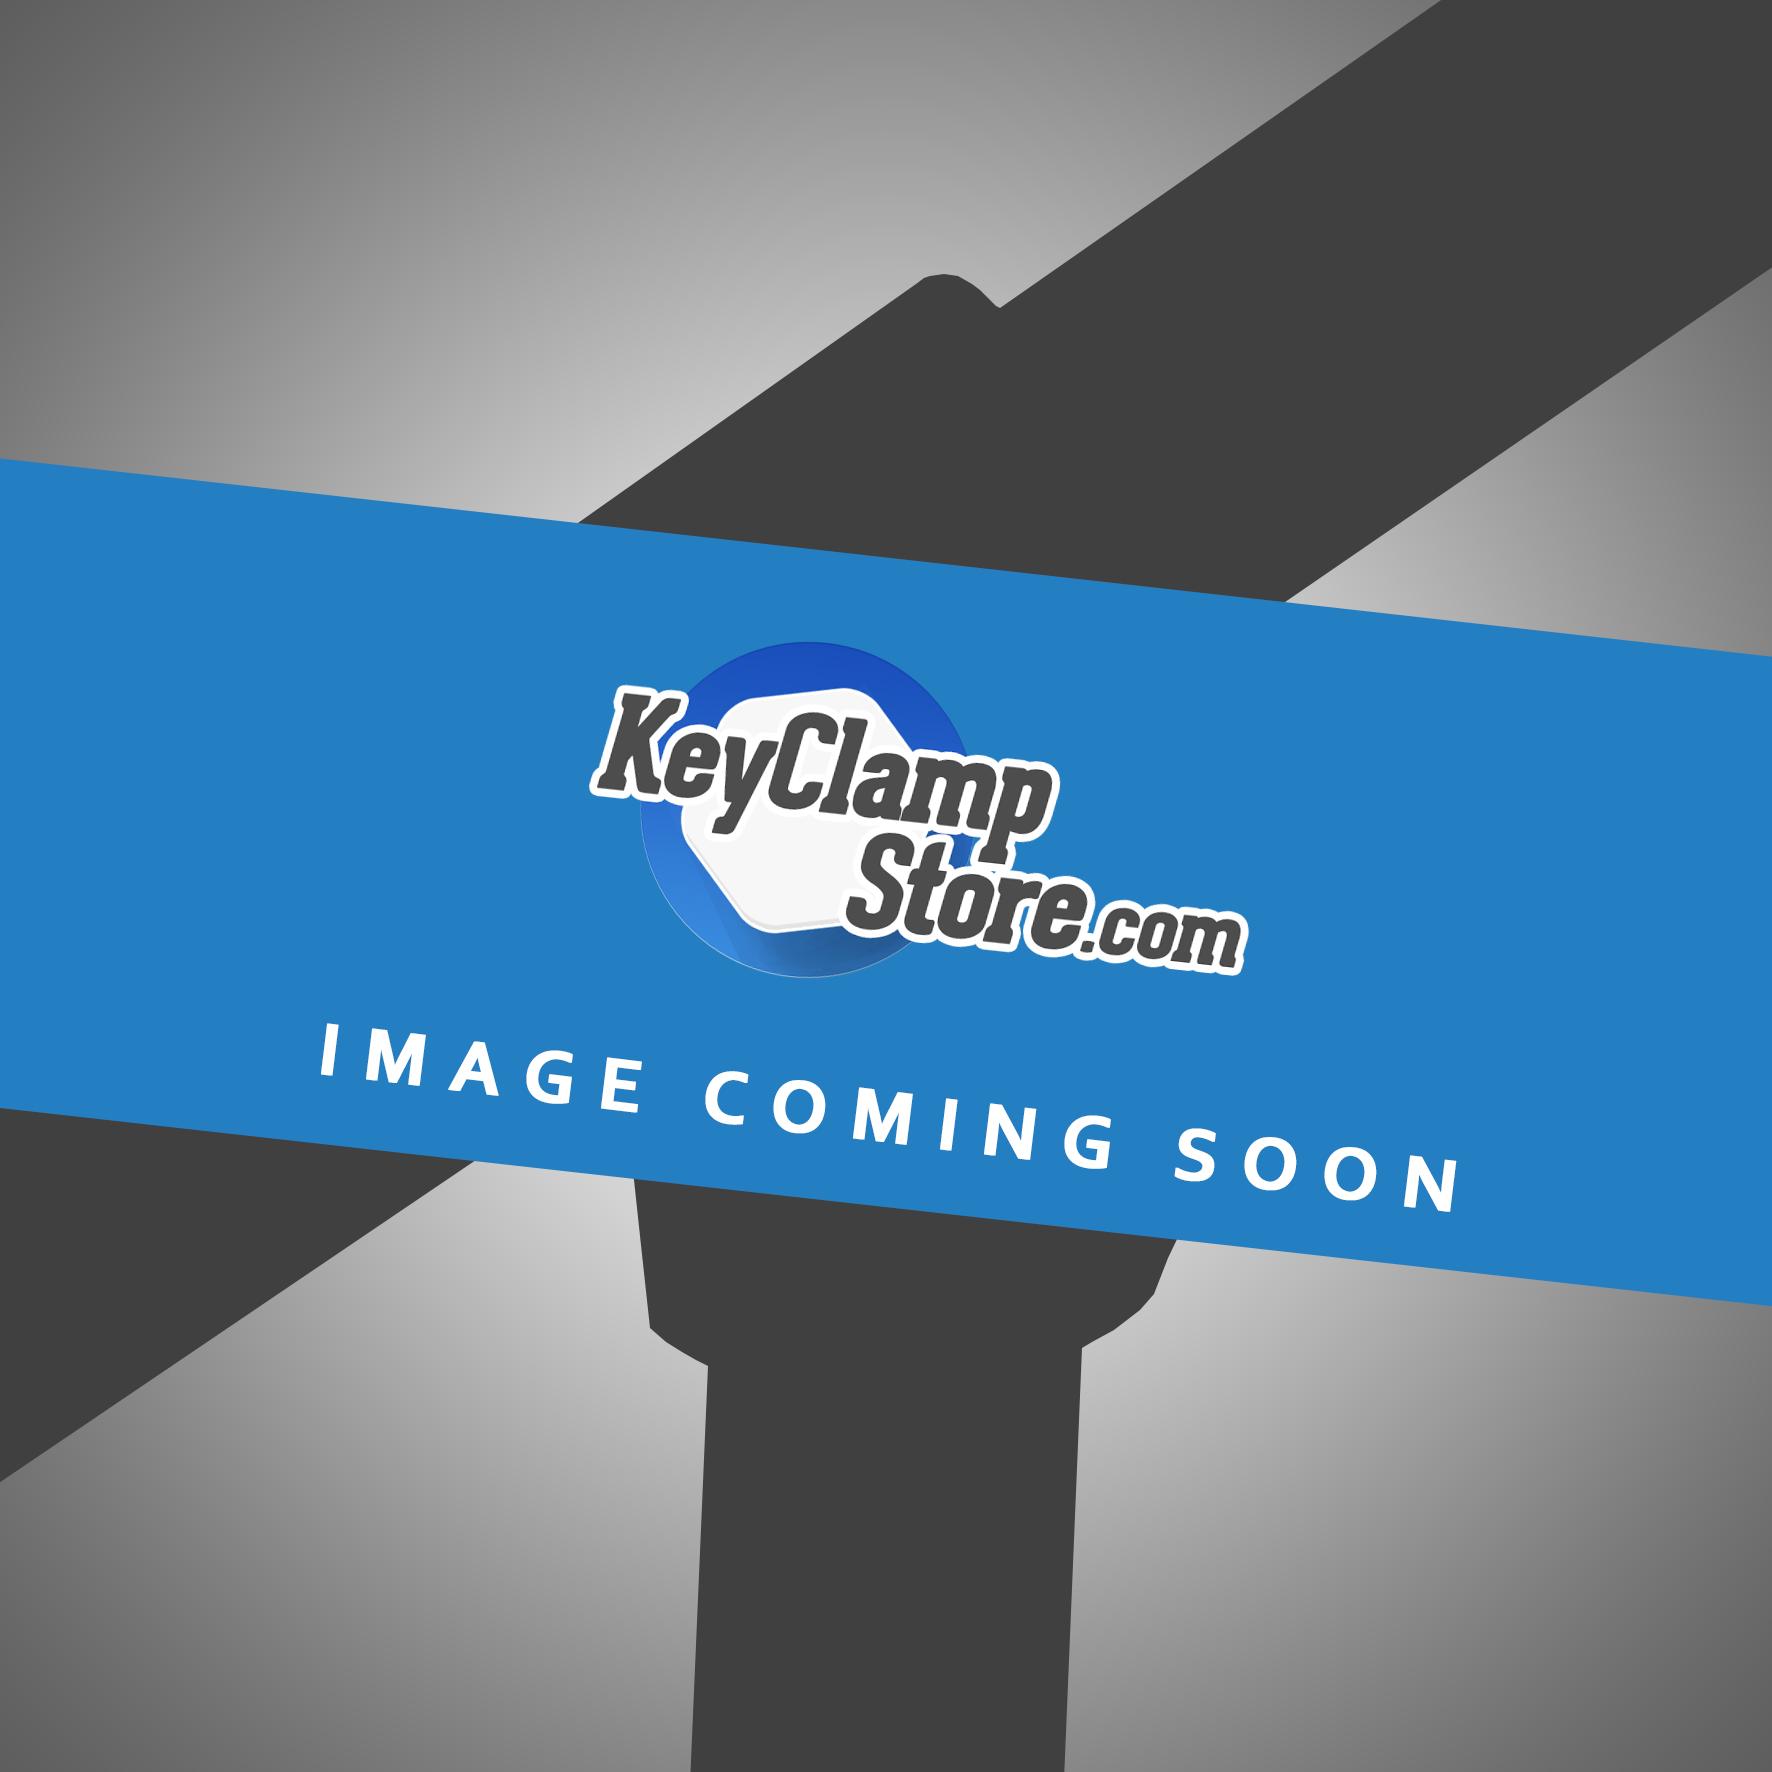 Key Clamp Handrailing Scaffold Size 48.3mm 48mm